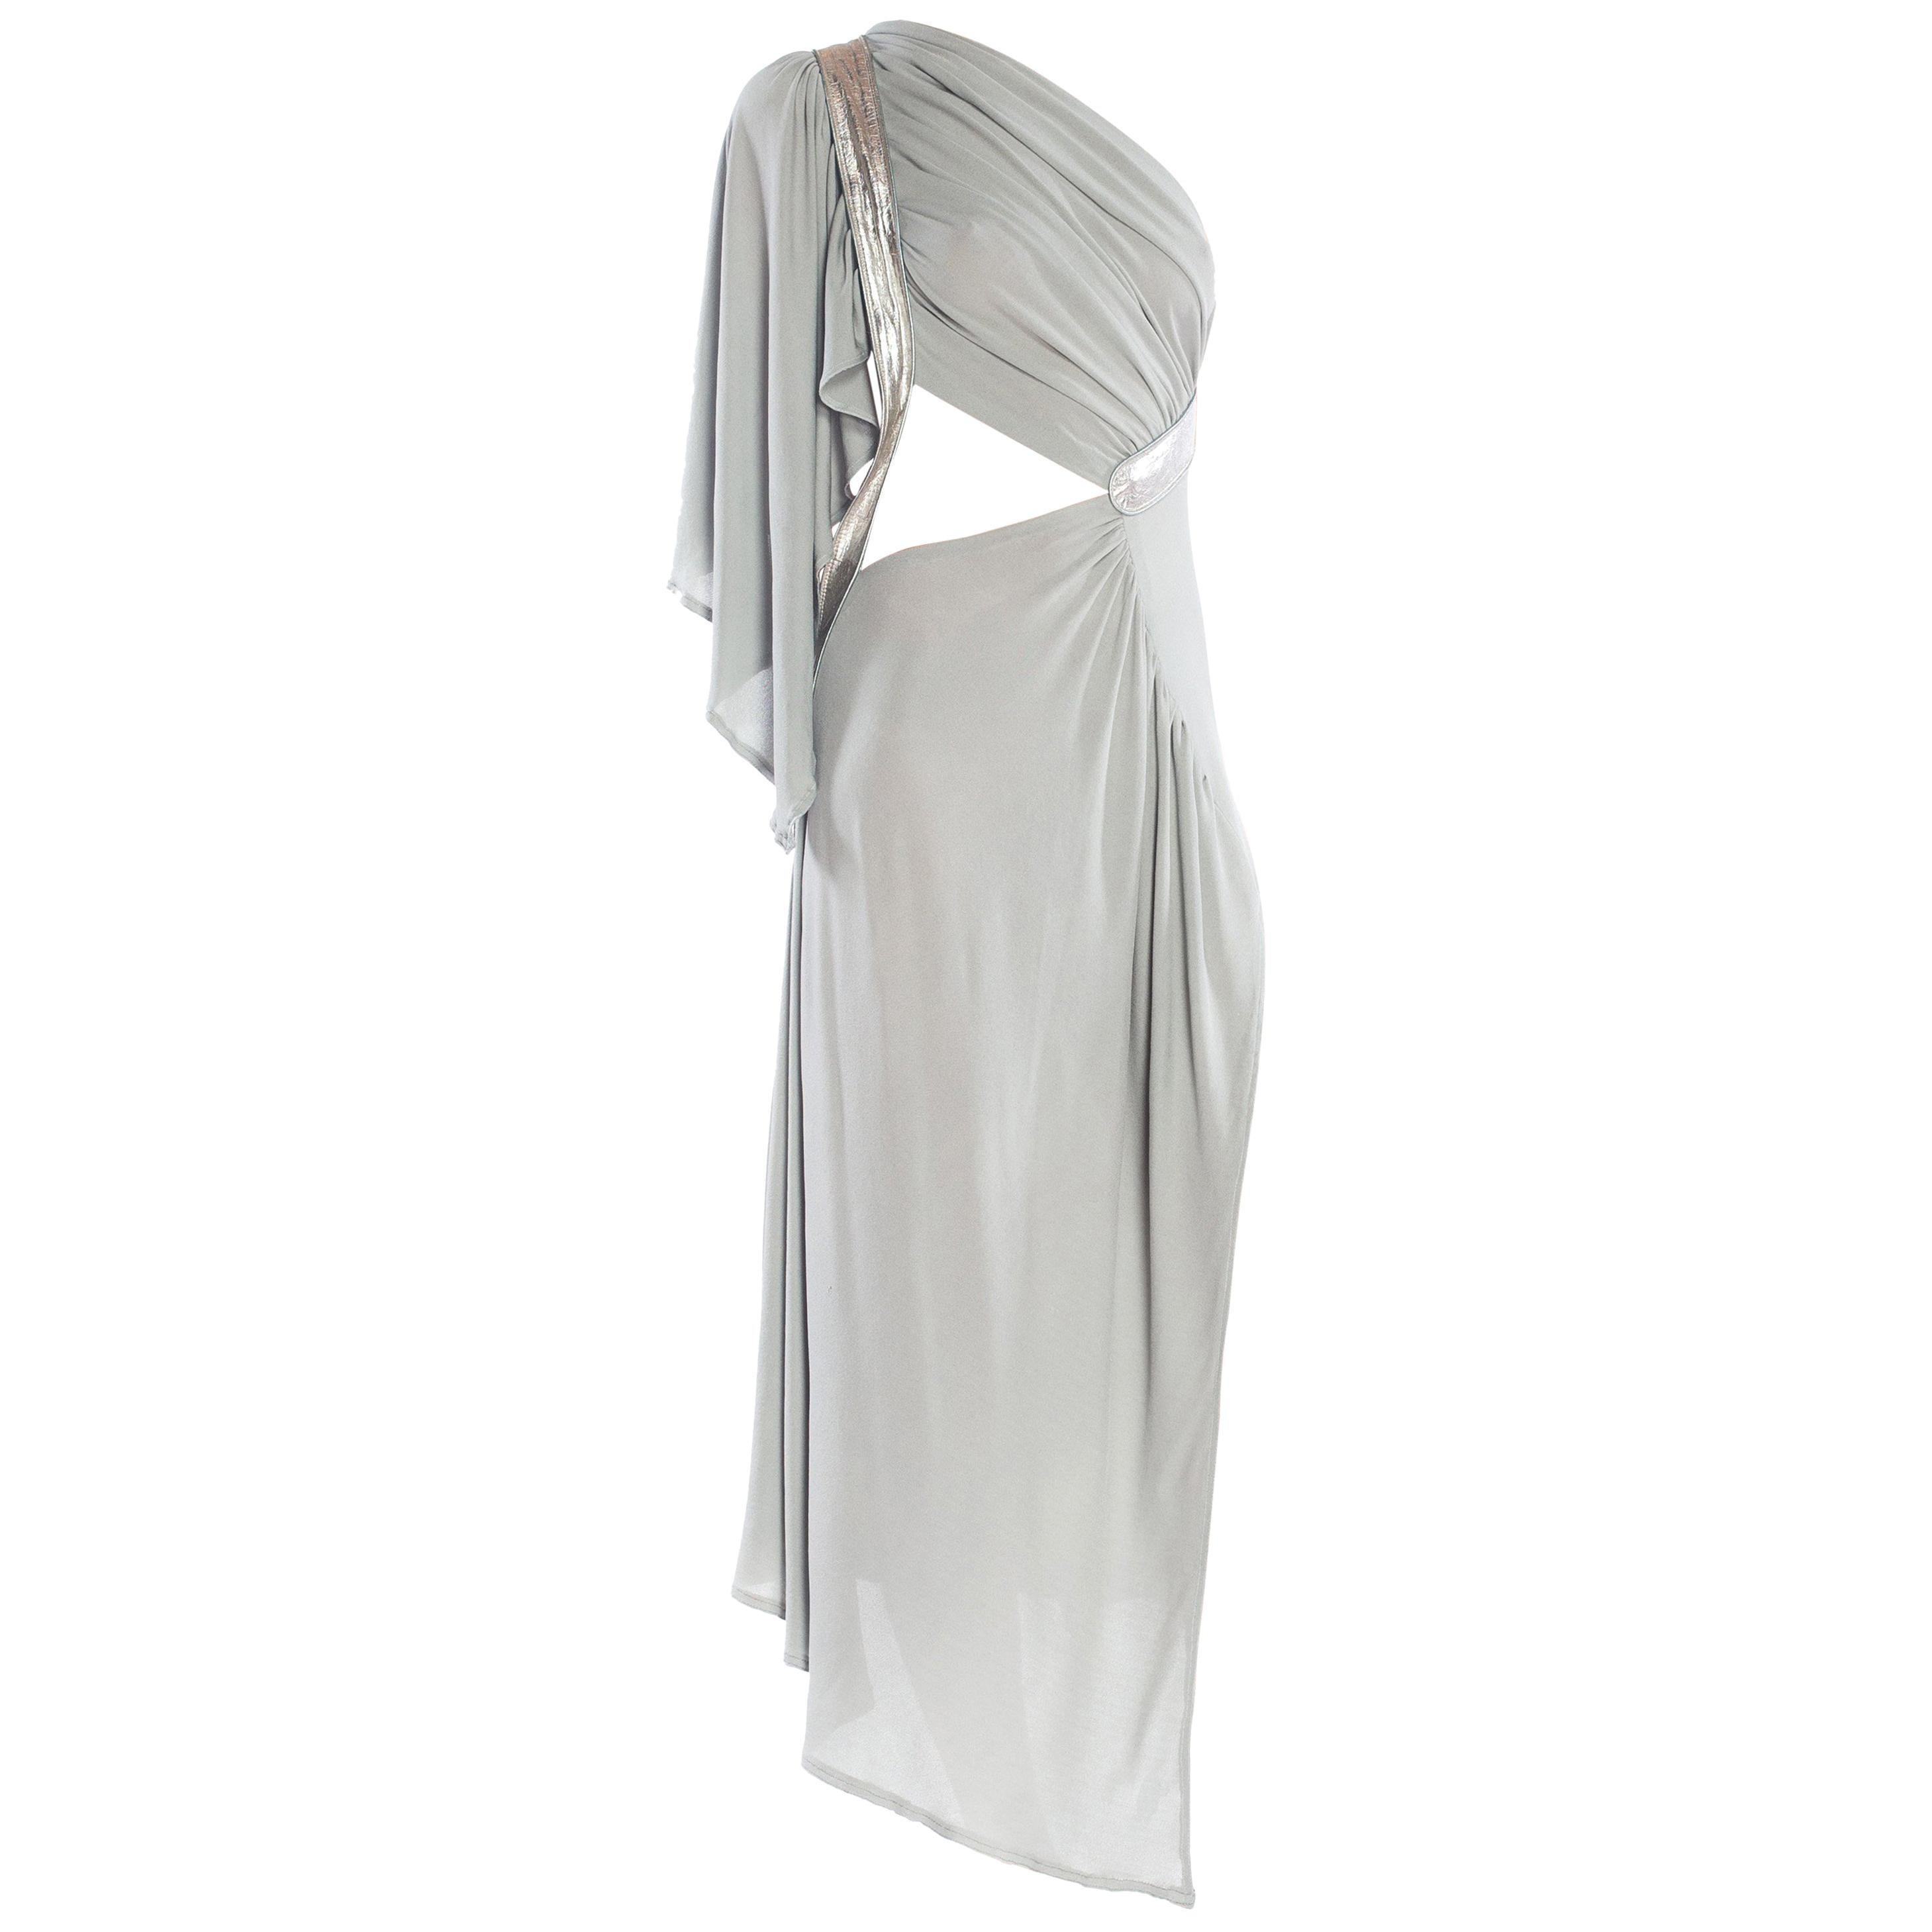 MORPHEW COLLECTION Seafoam Grey Silk Jersey Draped Cut-Out Cocktail Dress